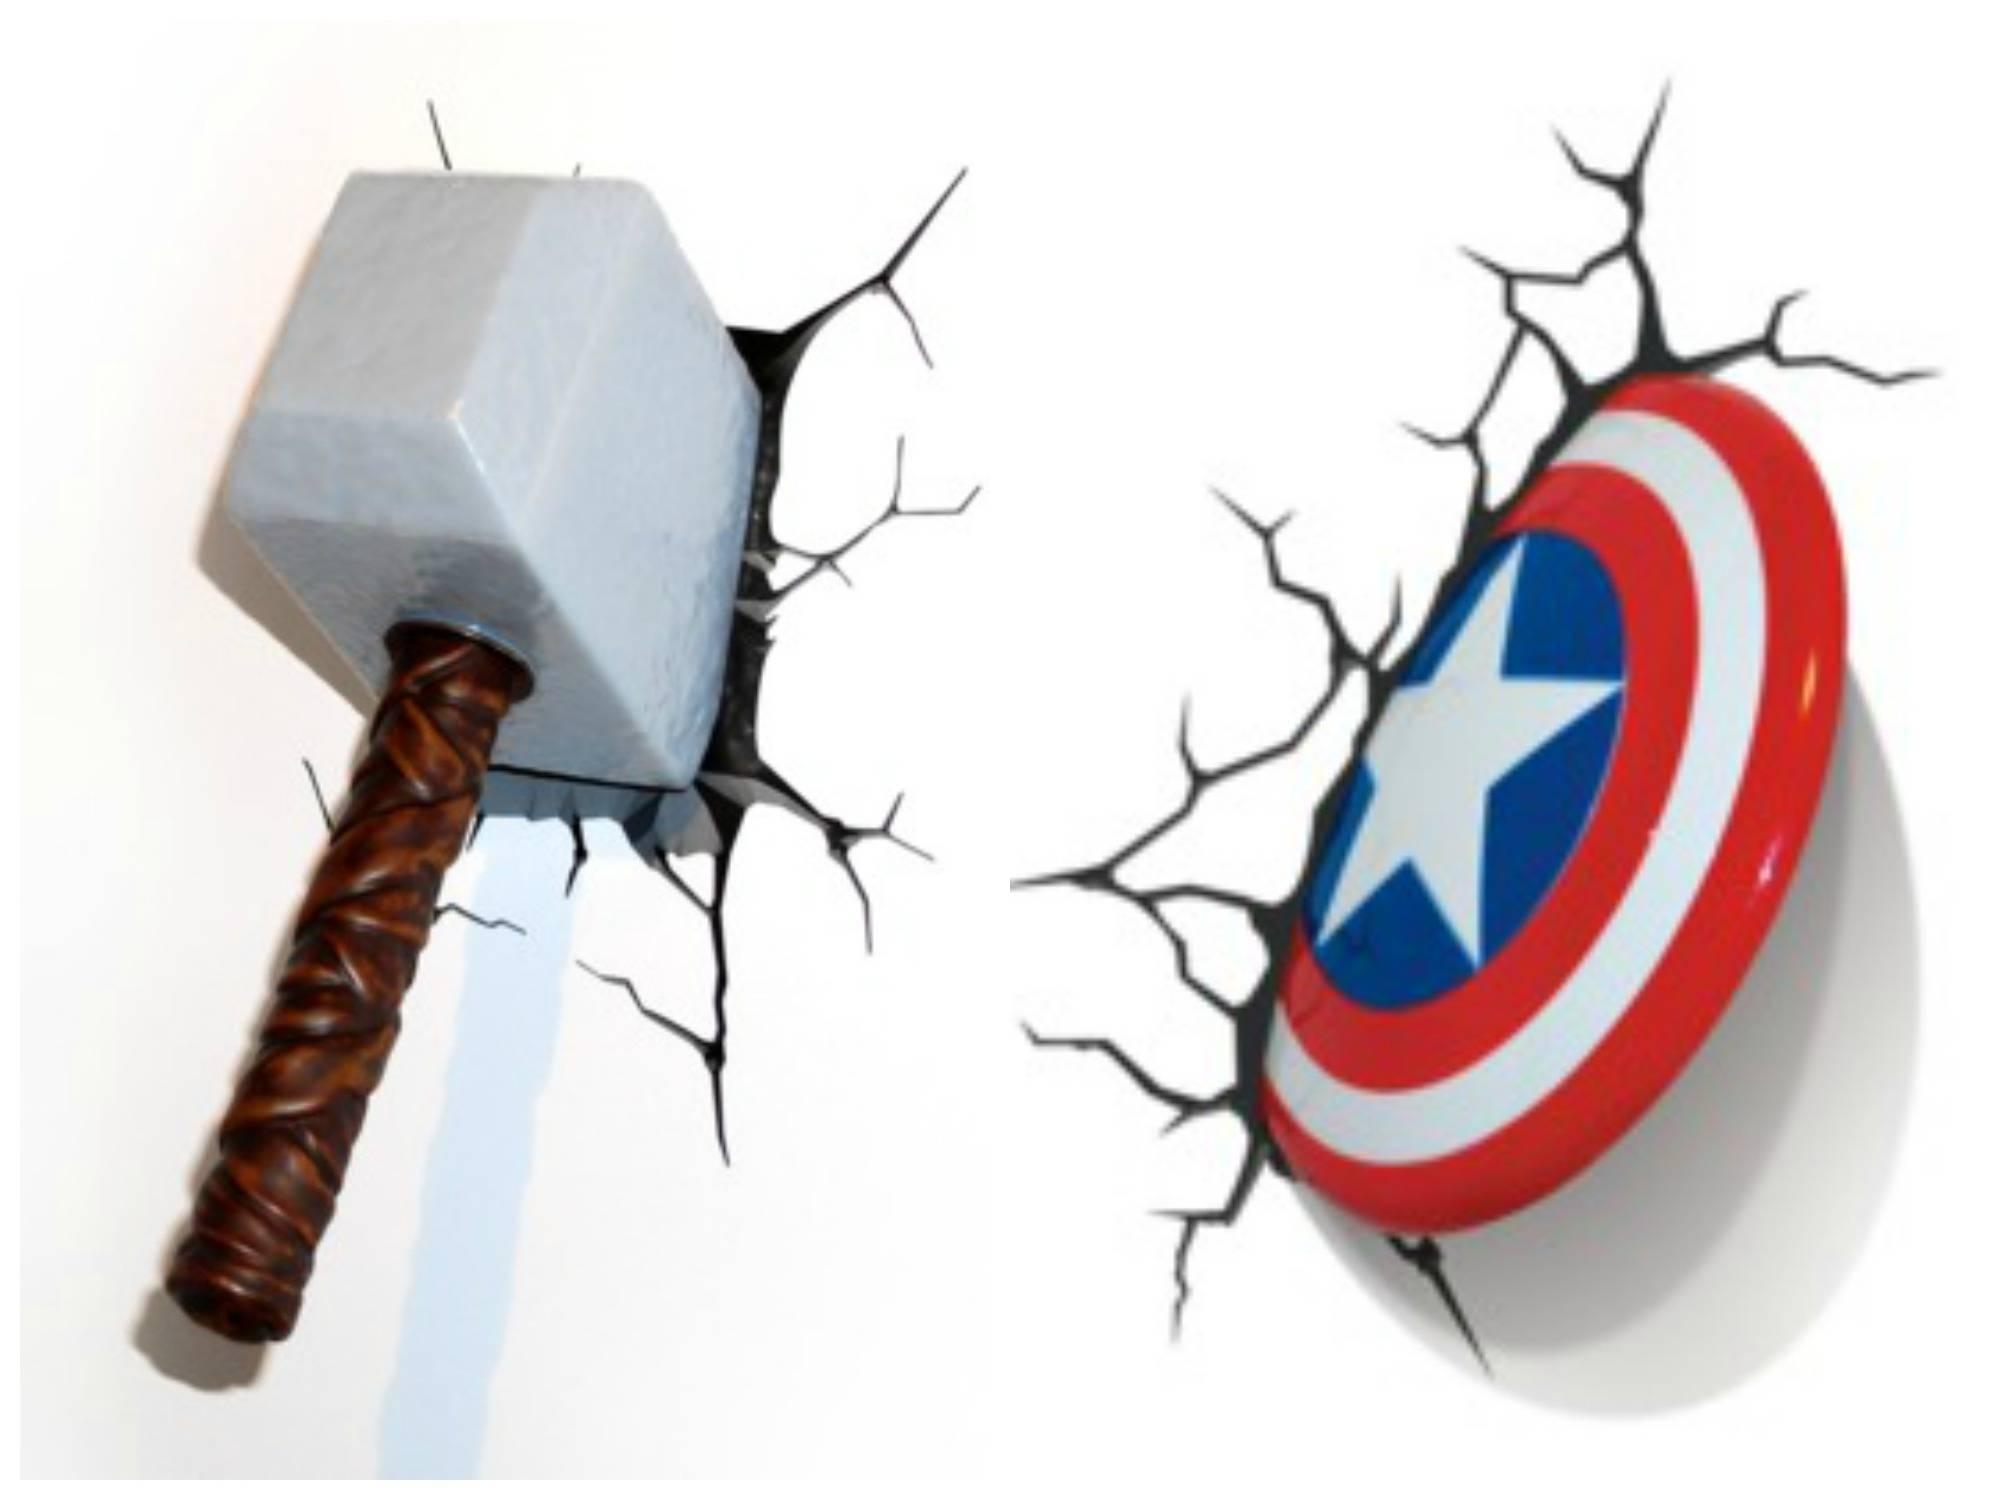 Avengers 3D Wall Art Uk | Wallartideas In Most Up To Date Avengers 3D Wall Art (View 5 of 20)